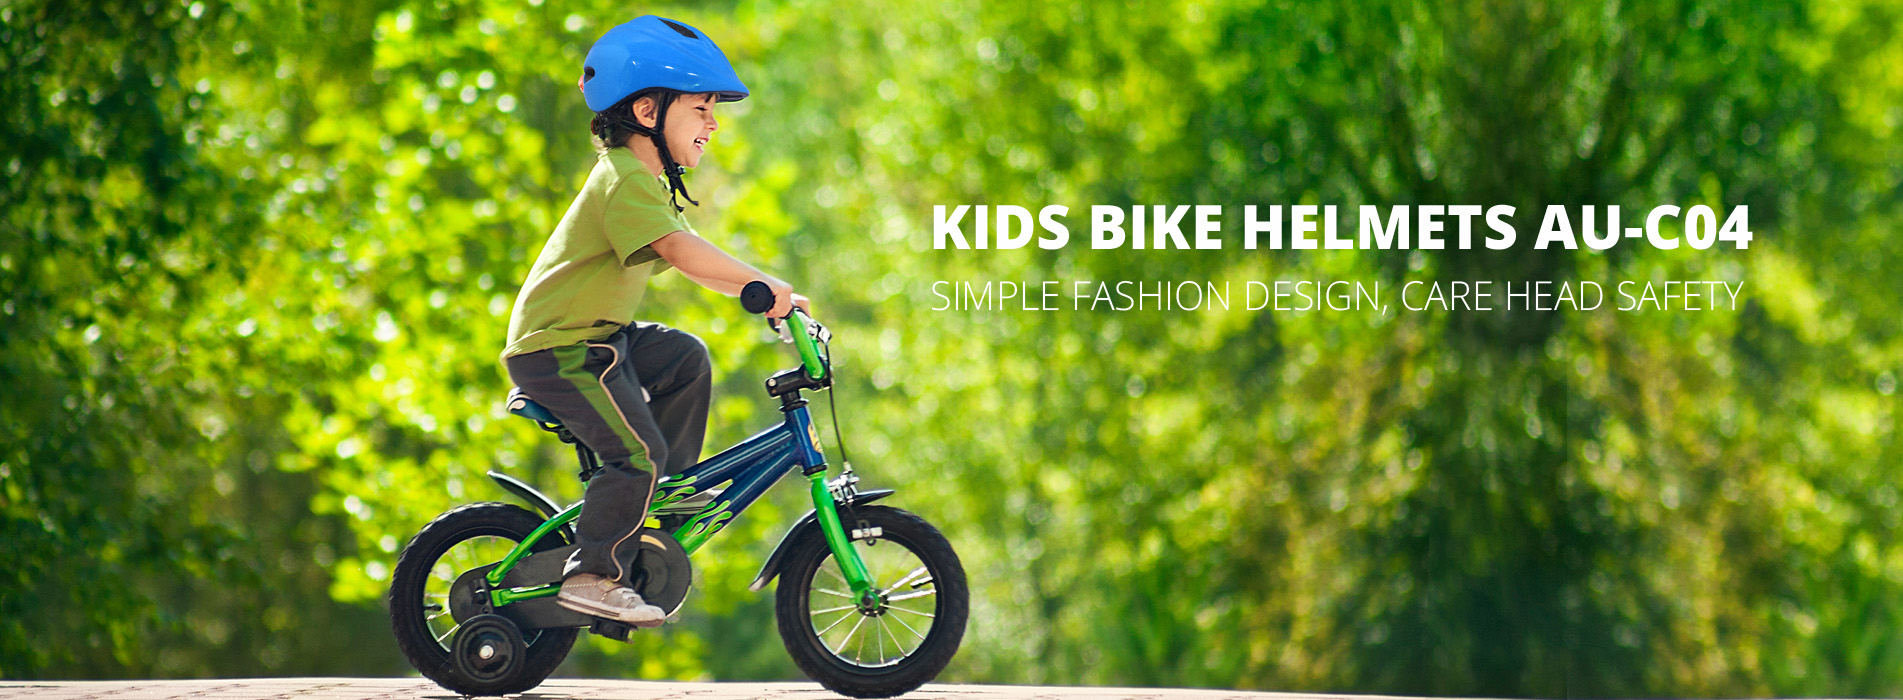 Kids bike helmets c04